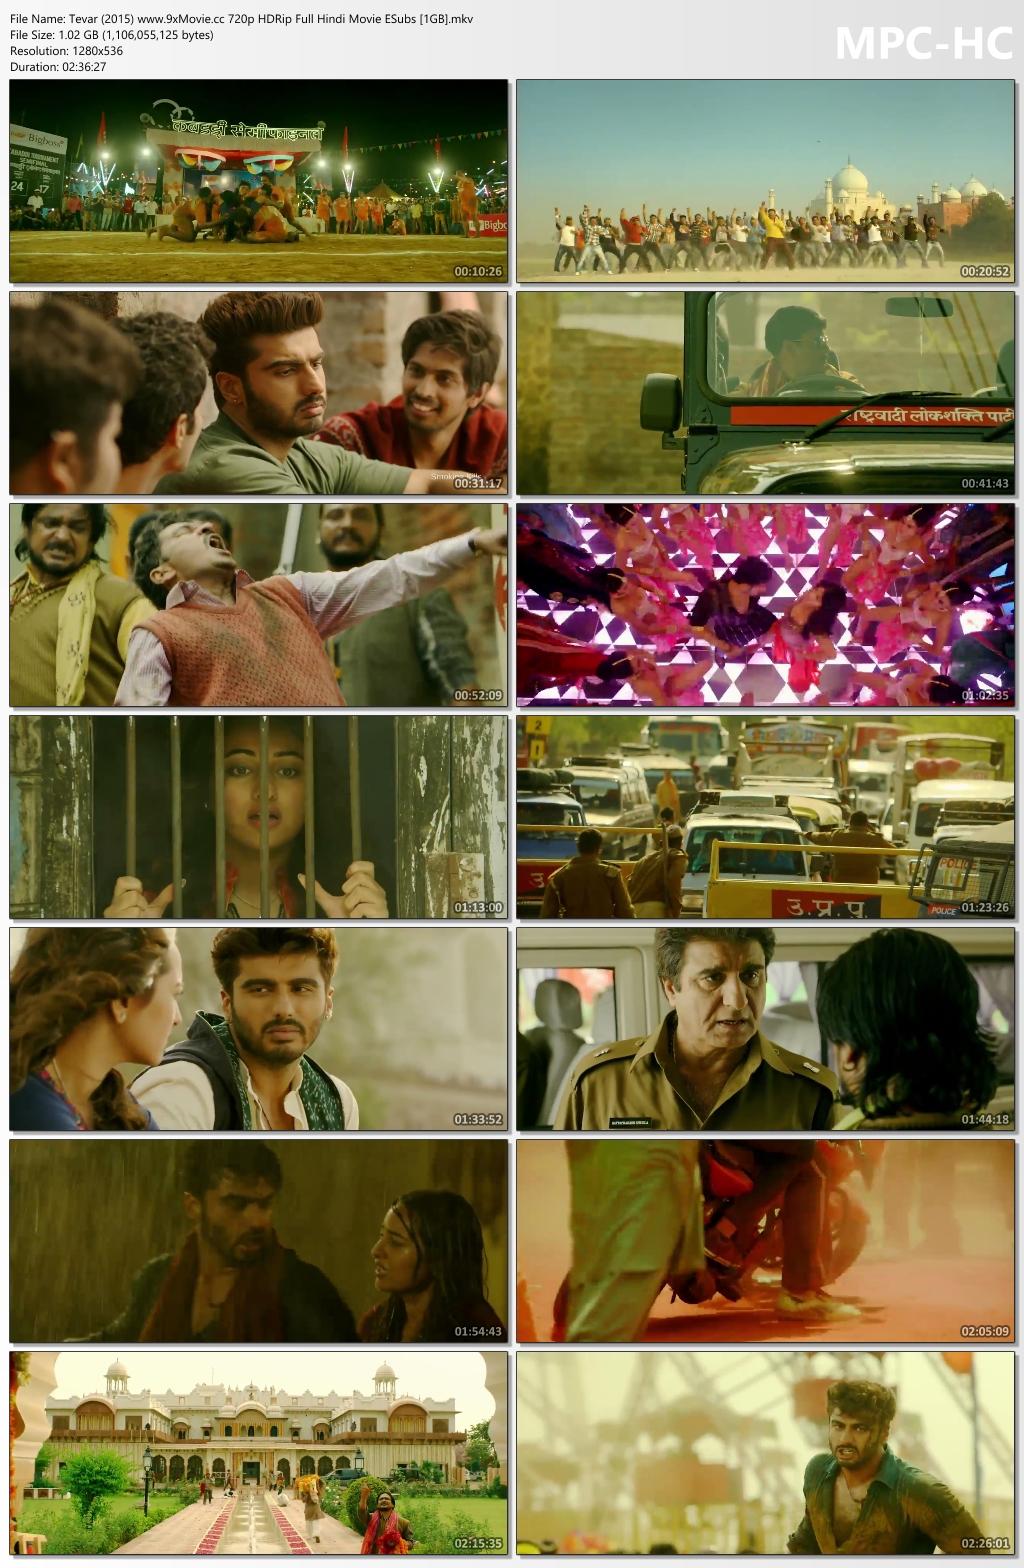 Tevar-2015-www-9x-Movie-cc-720p-HDRip-Full-Hindi-Movie-ESubs-1-GB-mkv